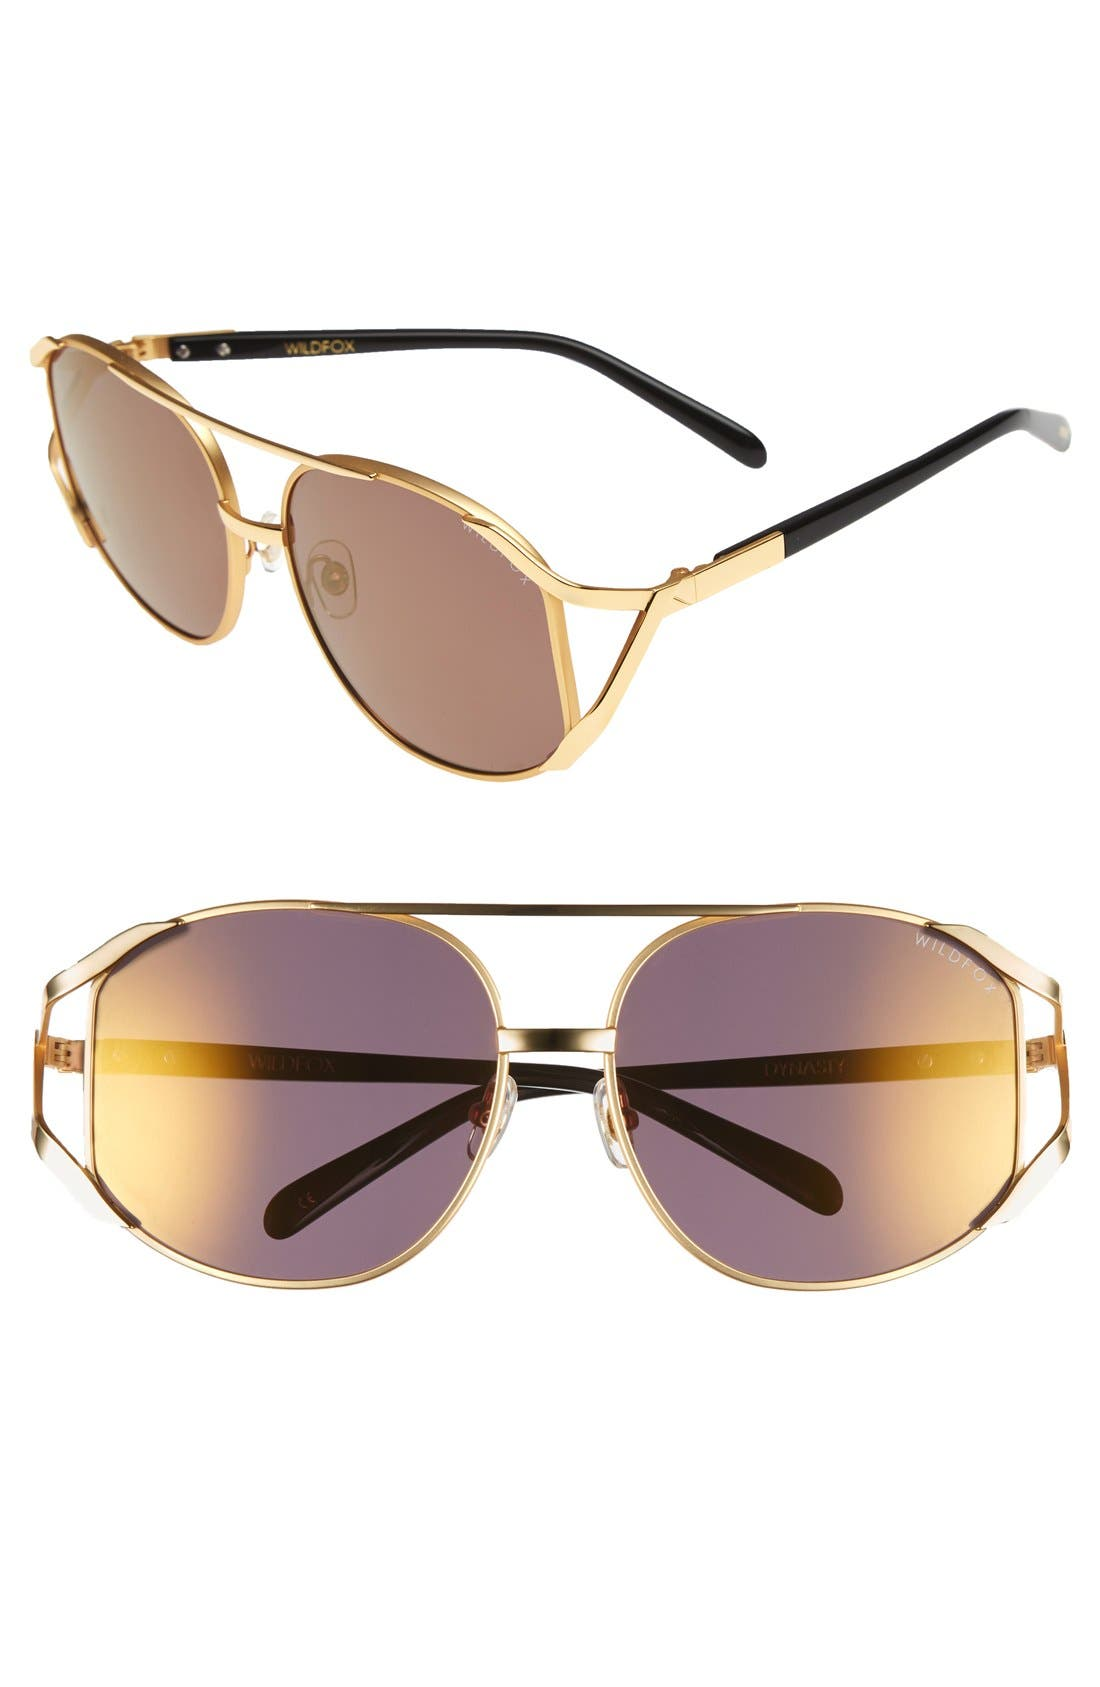 Main Image - Wildfox 'Dynasty Deluxe' 59mm Retro Sunglasses